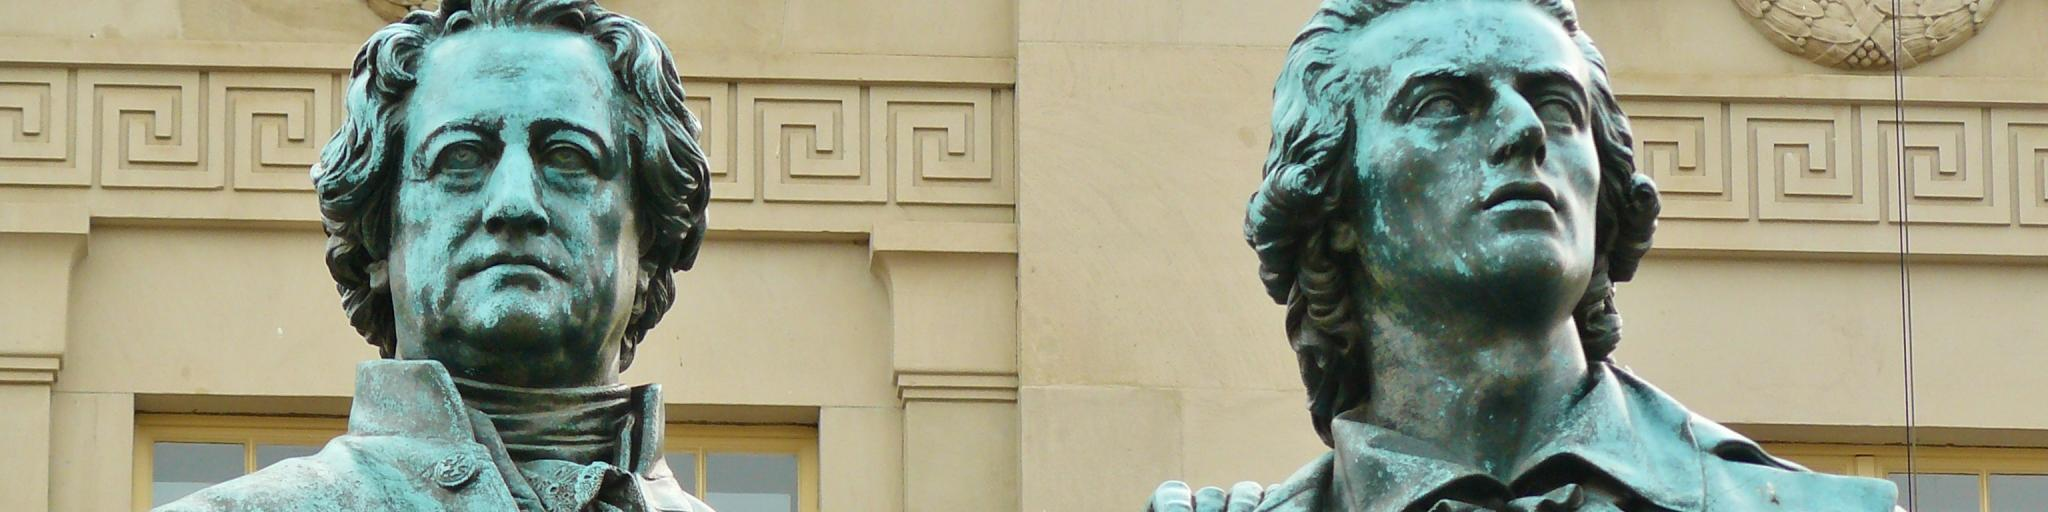 The statue of Goethe and Schiller in Weimar, Germany